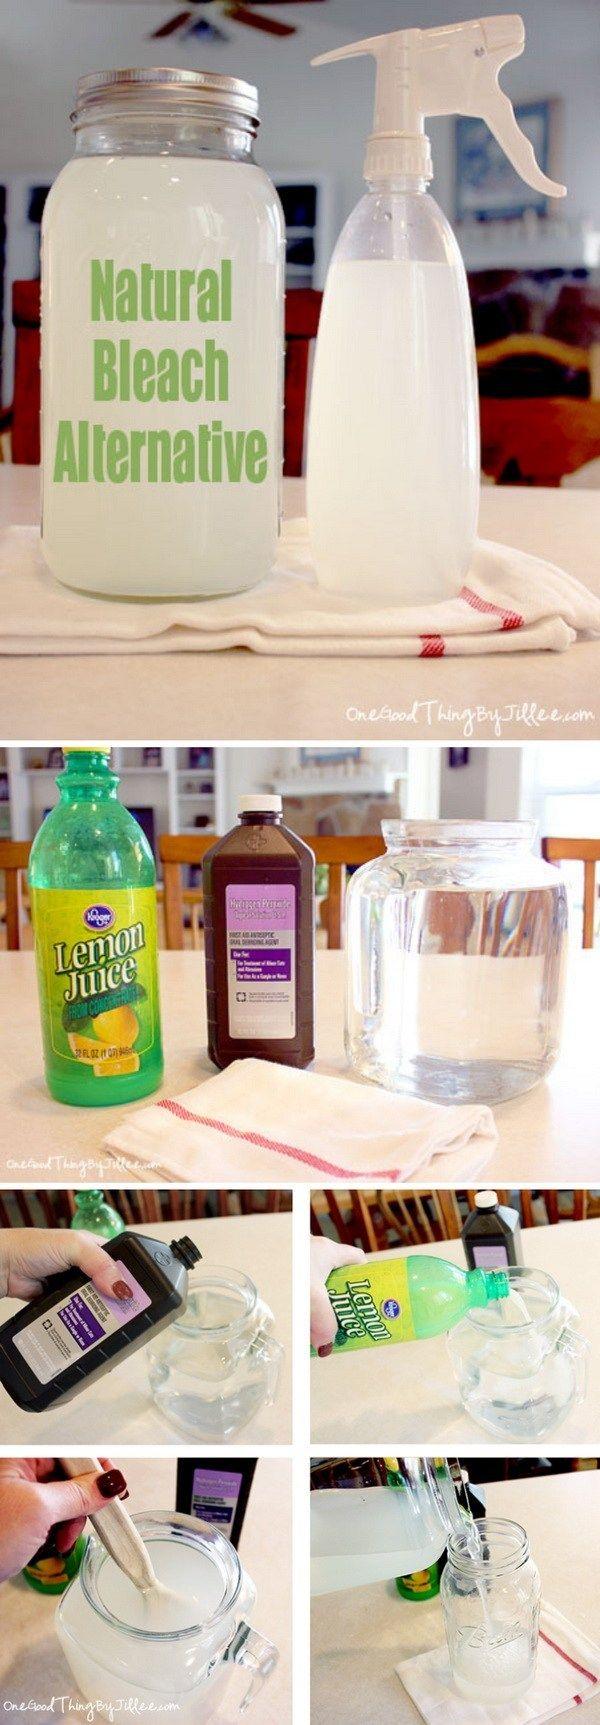 Homemade Cleaner Recipes and Tutorials Homemade bleach